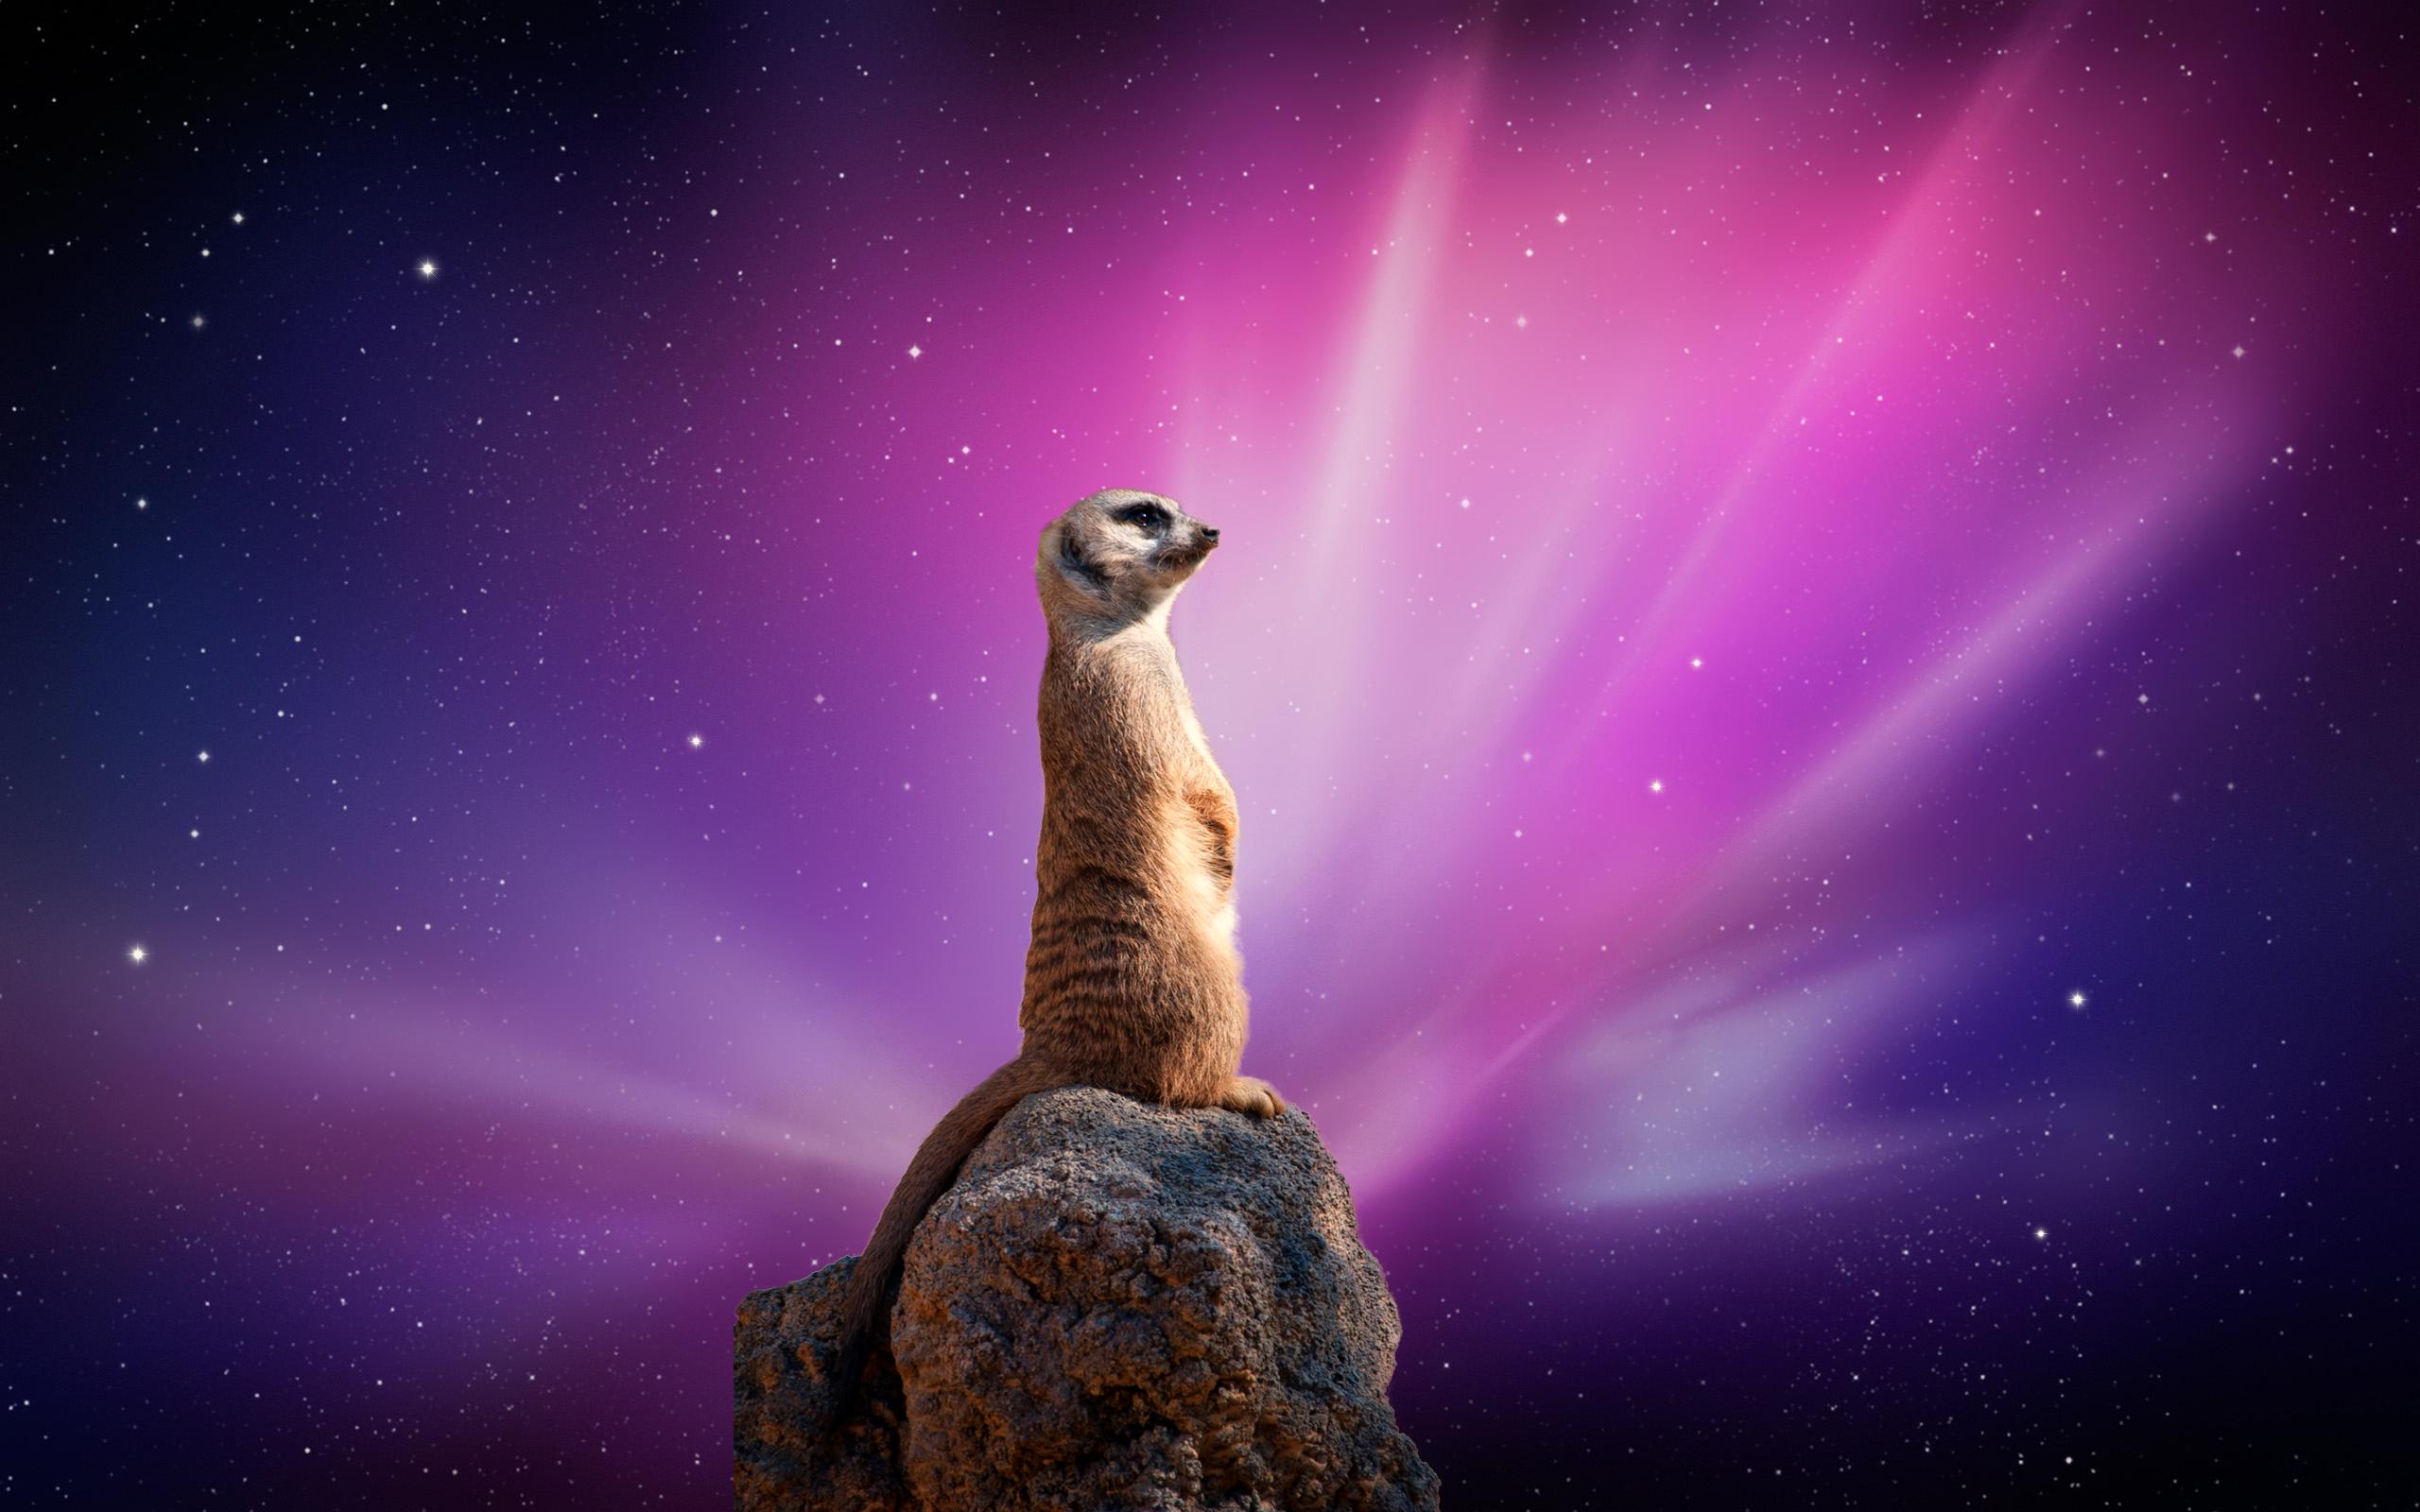 Sloth Wallpaper Cute Meerkat Full Hd Wallpaper And Background Image 2560x1600